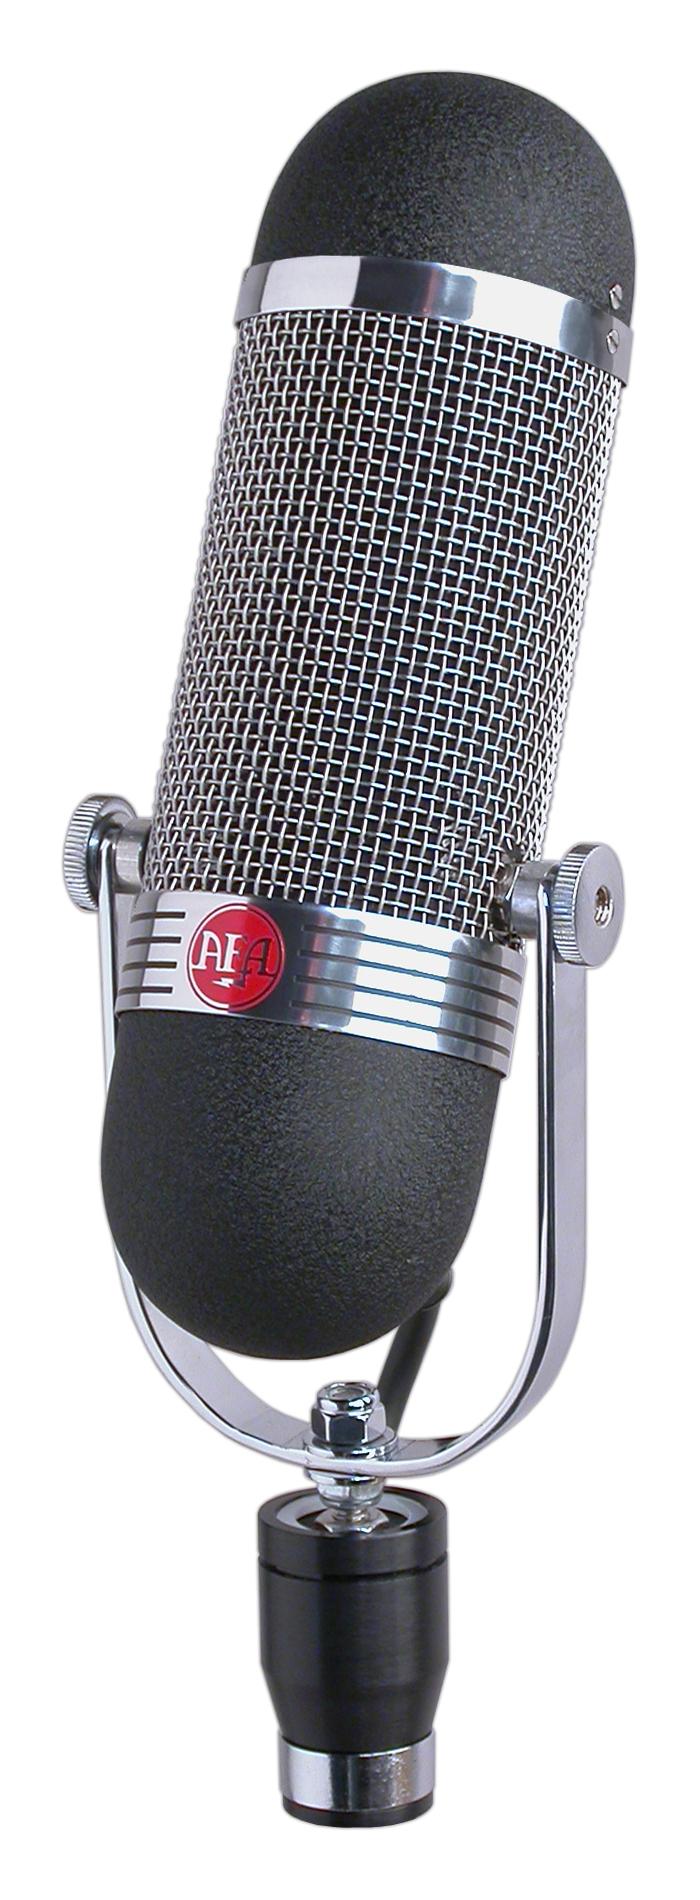 aea microphones r84 ribbon mic long mcquade musical instruments